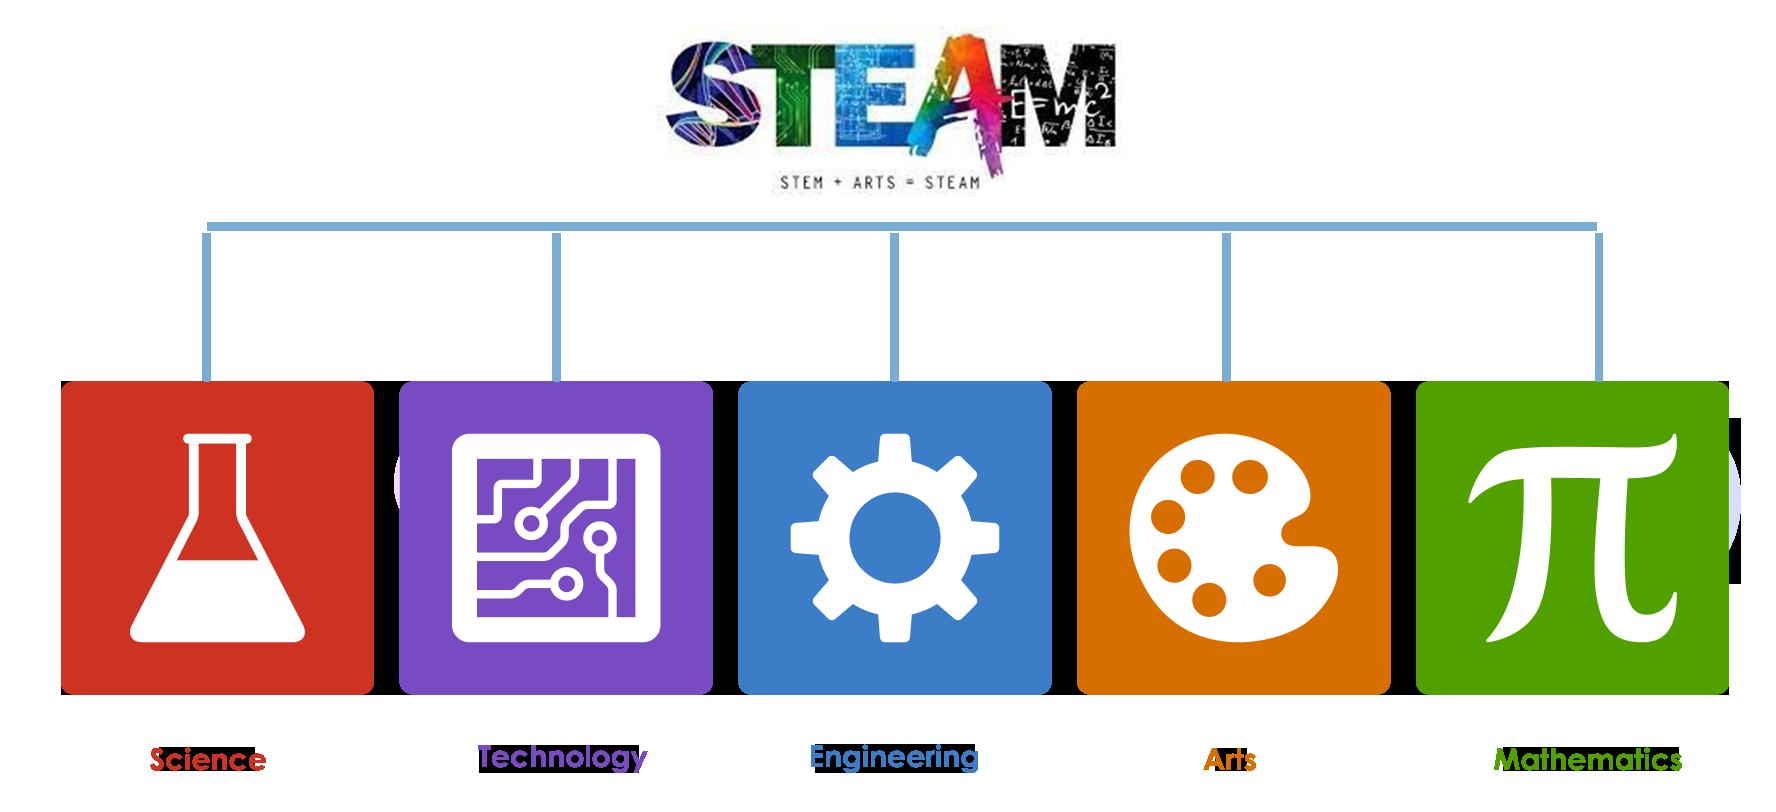 STEAM program - نظام STEAM